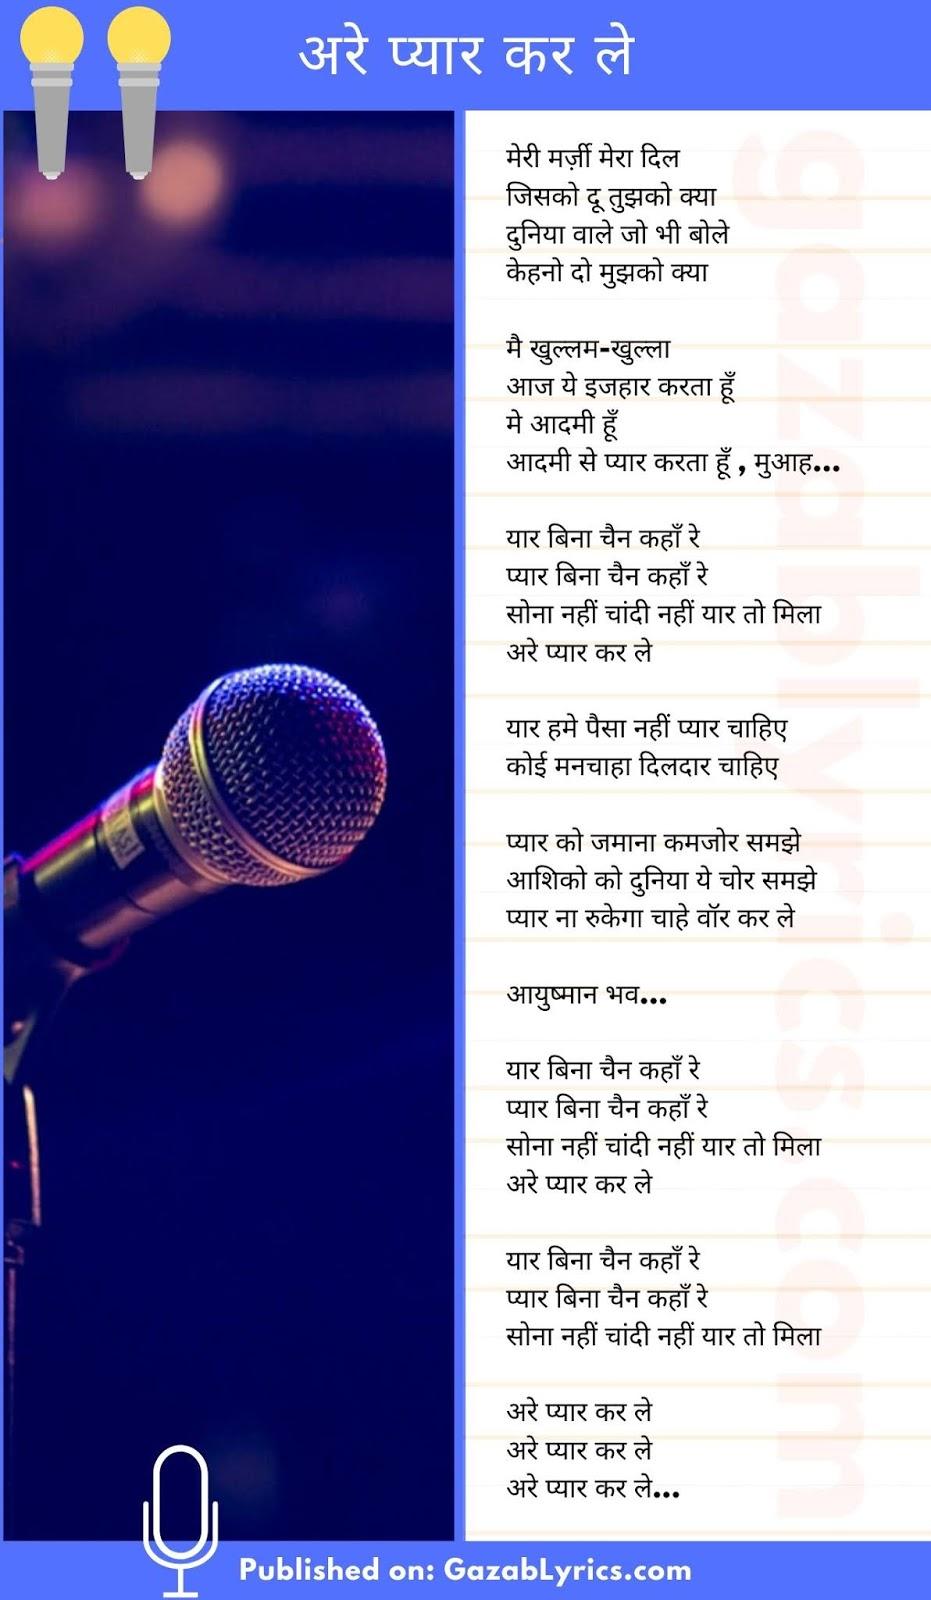 Arey Pyar Kar Le song lyrics image